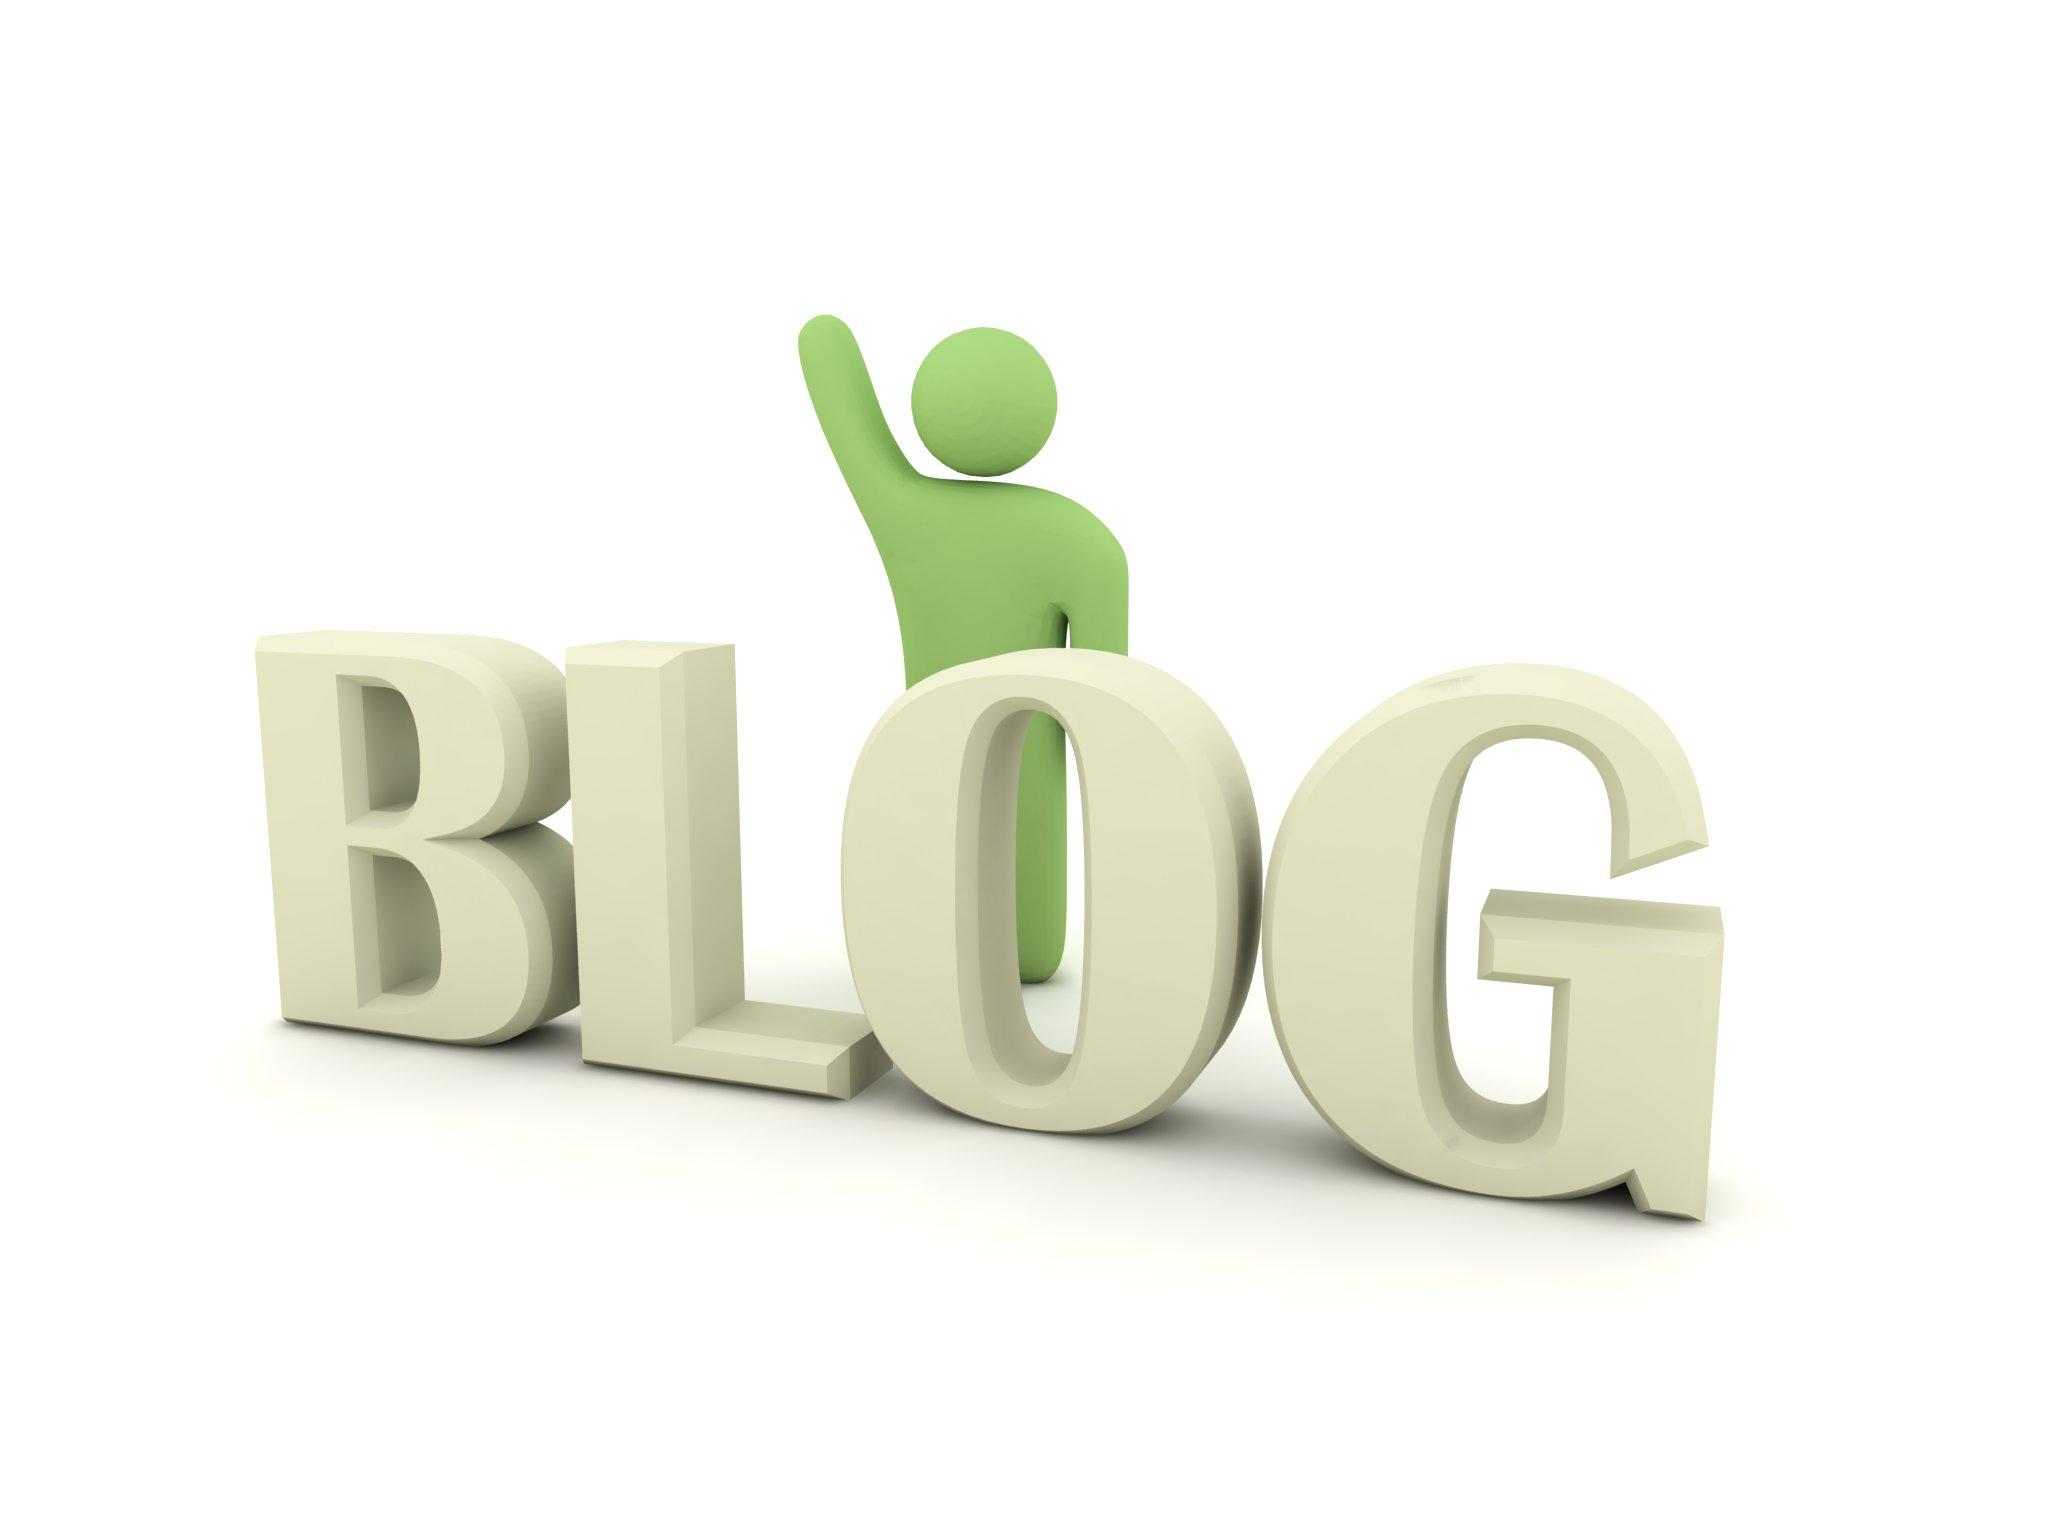 Blogging Environment